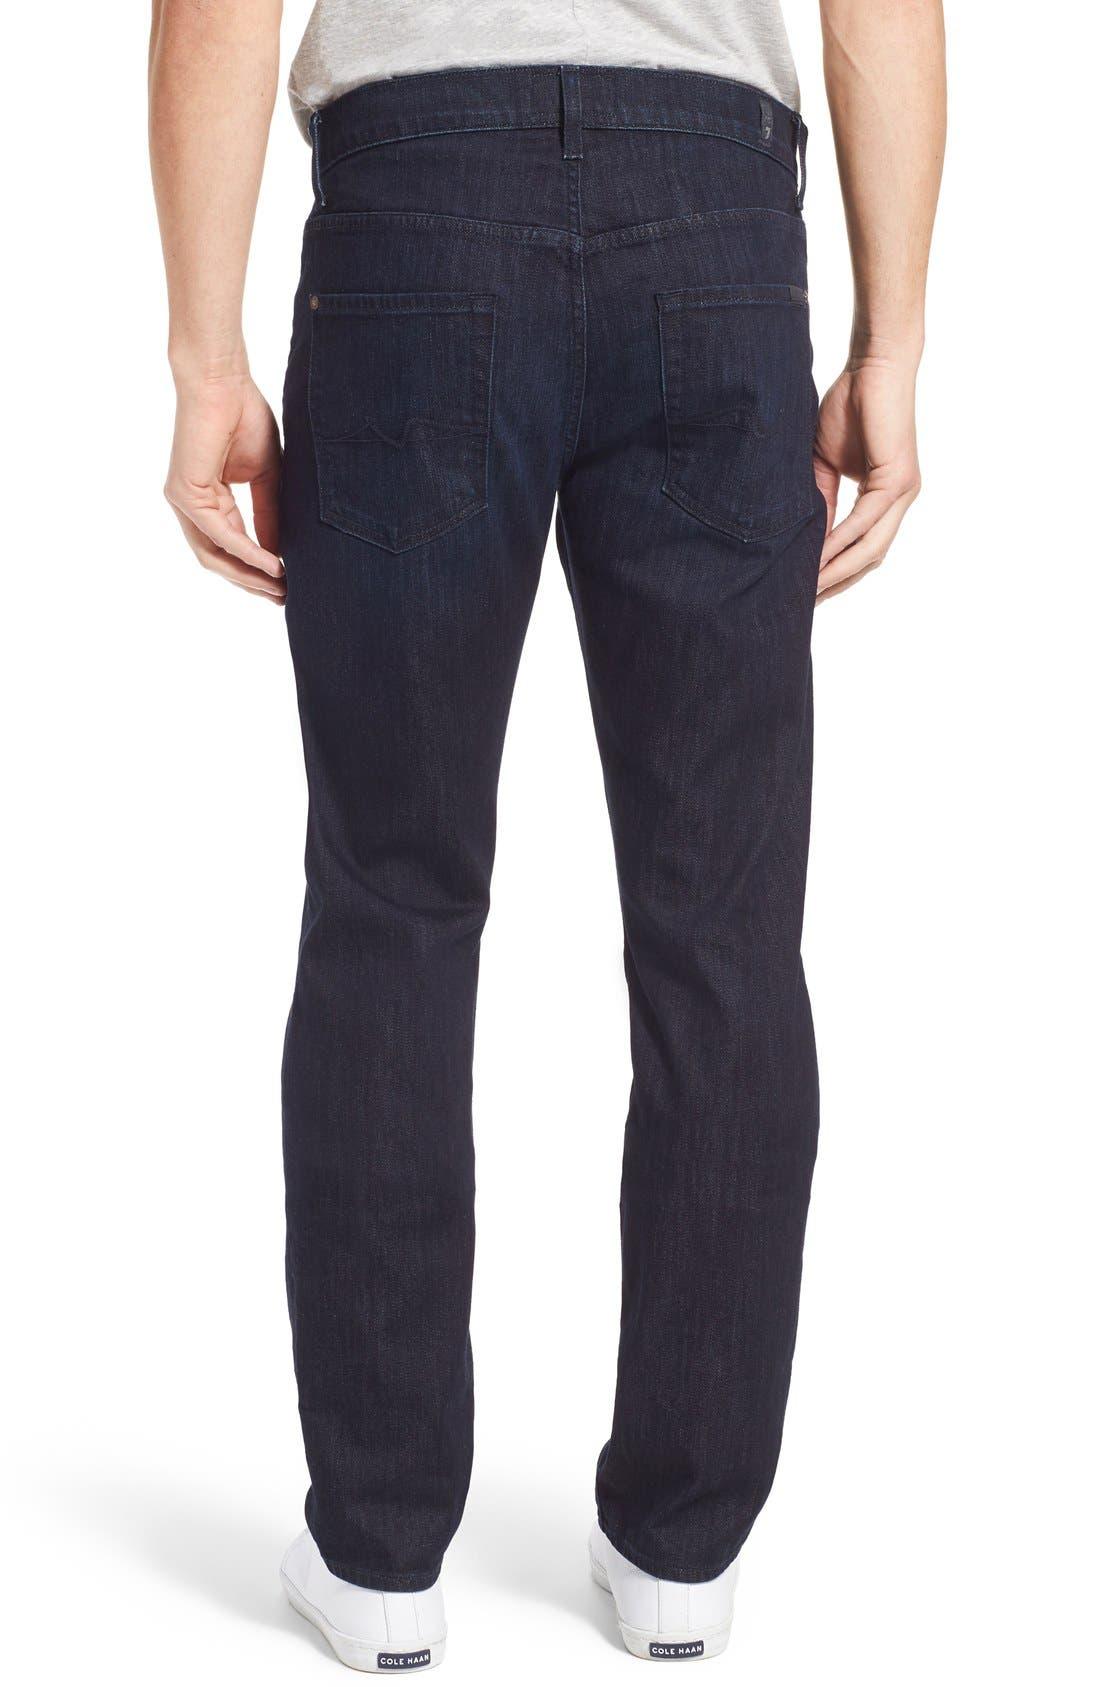 Alternate Image 2  - 7 For All Mankind® 'Straight - Luxe Performance' Slim Straight Leg Jeans (Rebellion)